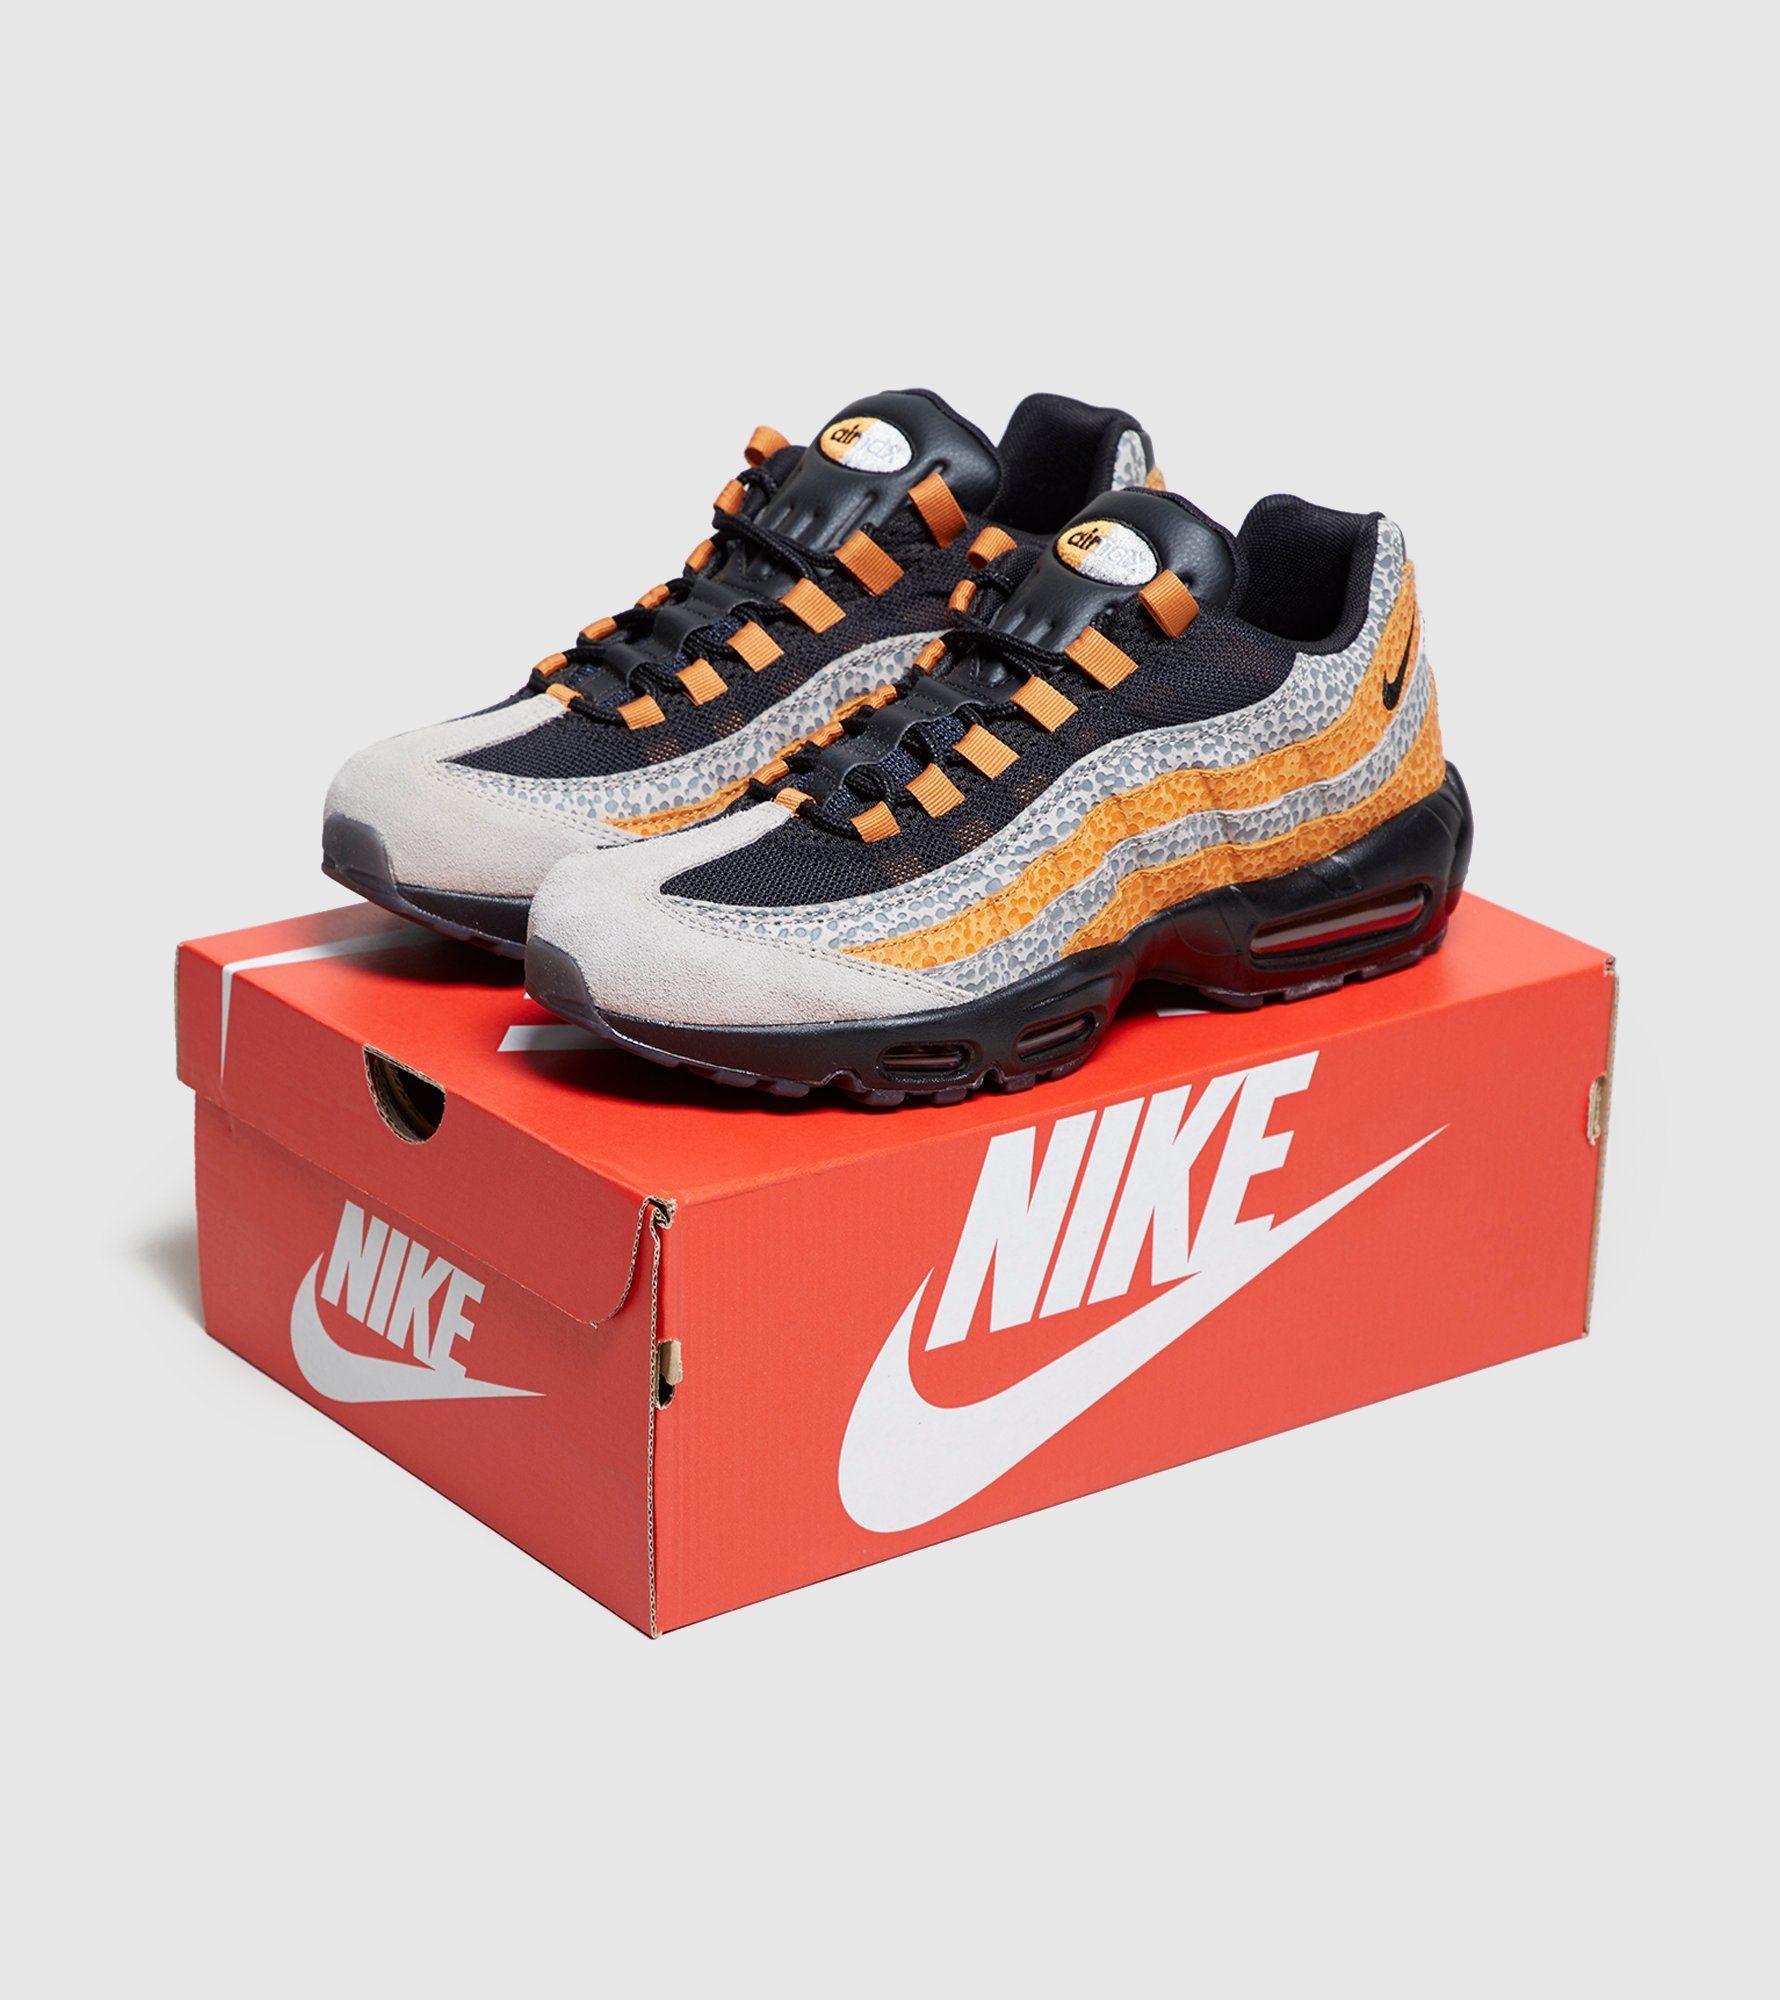 Nike Air Max 95 ?What The Safari? - size? Exclusive